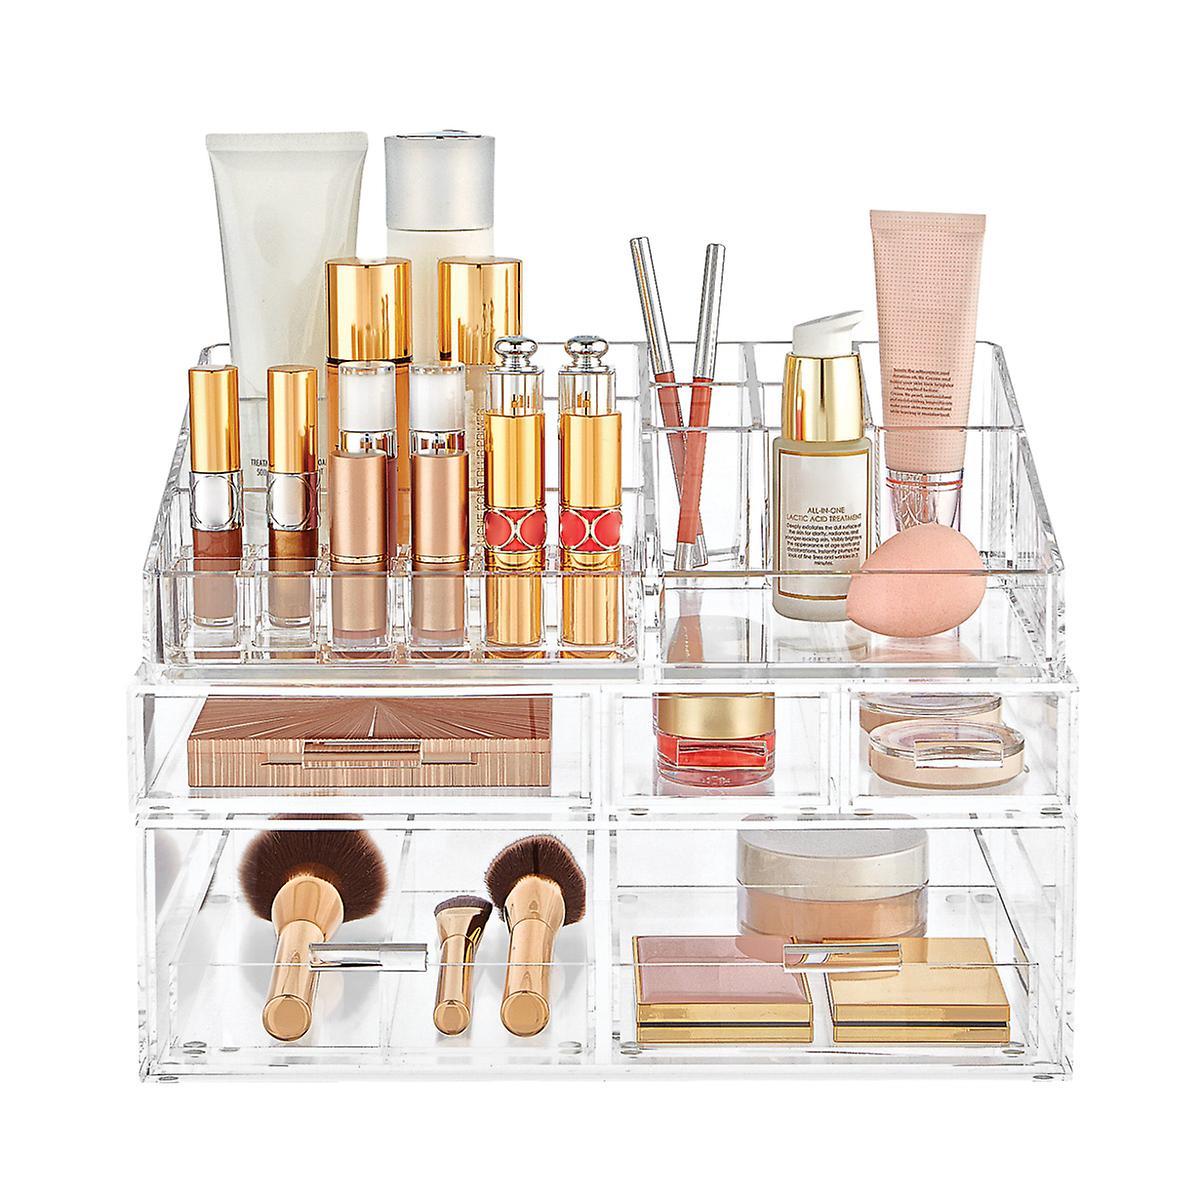 Luxe Acrylic Lipstick & Makeup Storage Starter ...